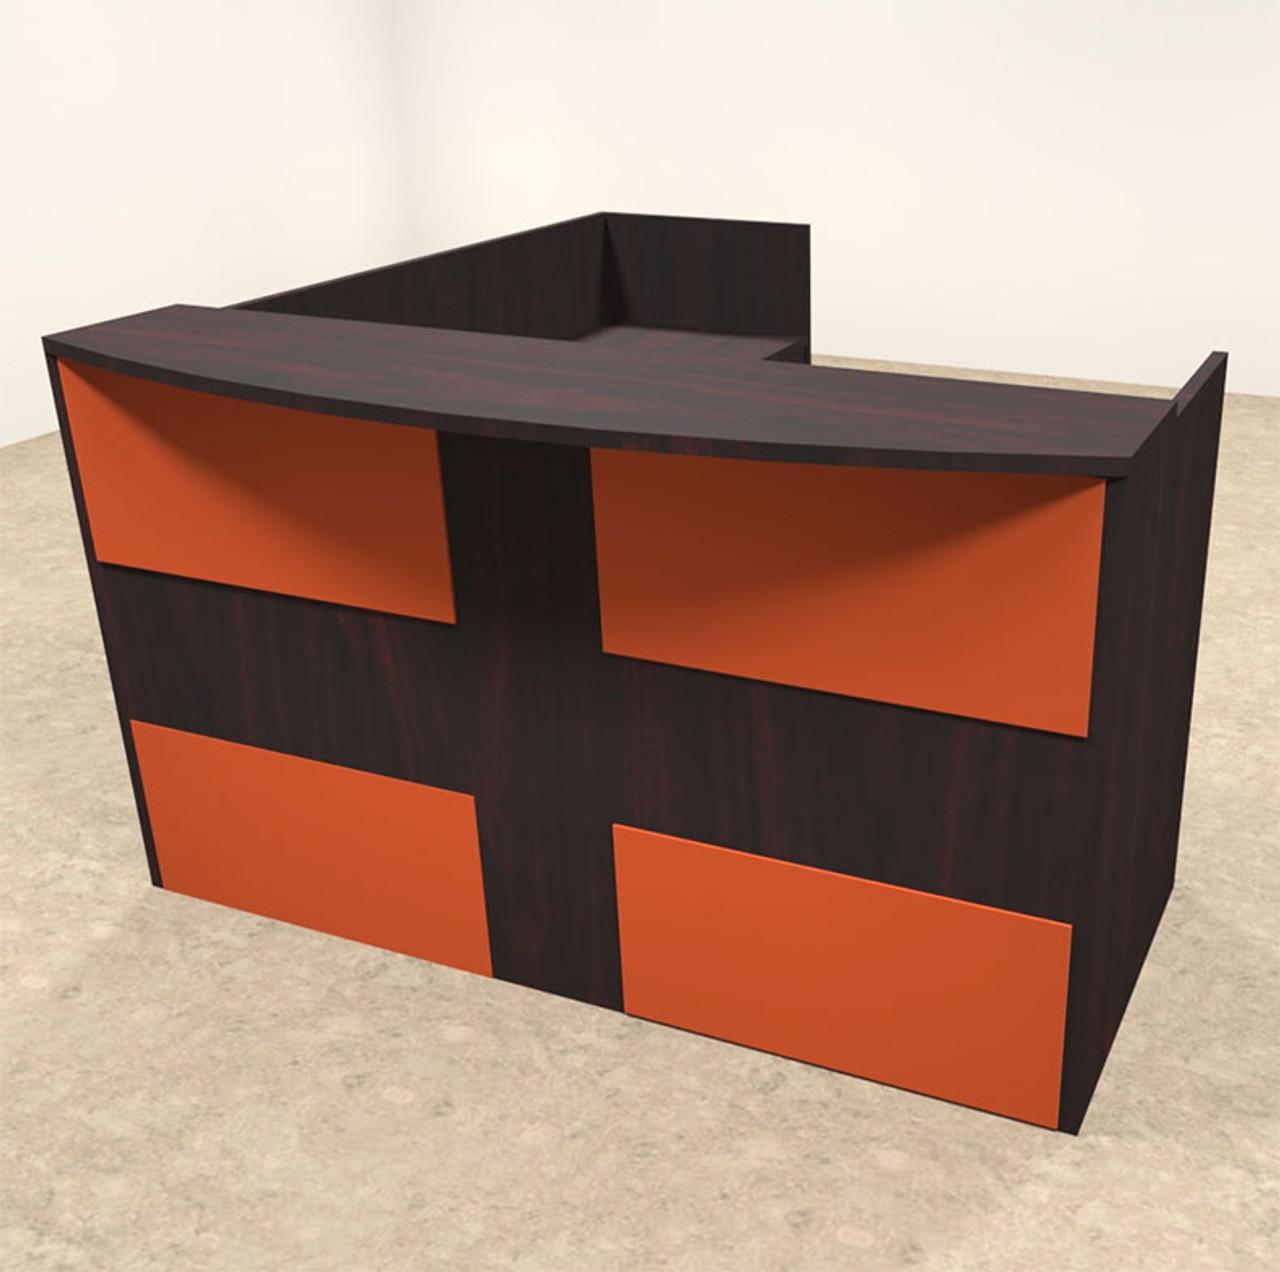 3pc L Shaped Modern Acrylic Panel Office Reception Desk, #OT-SUL-RO35